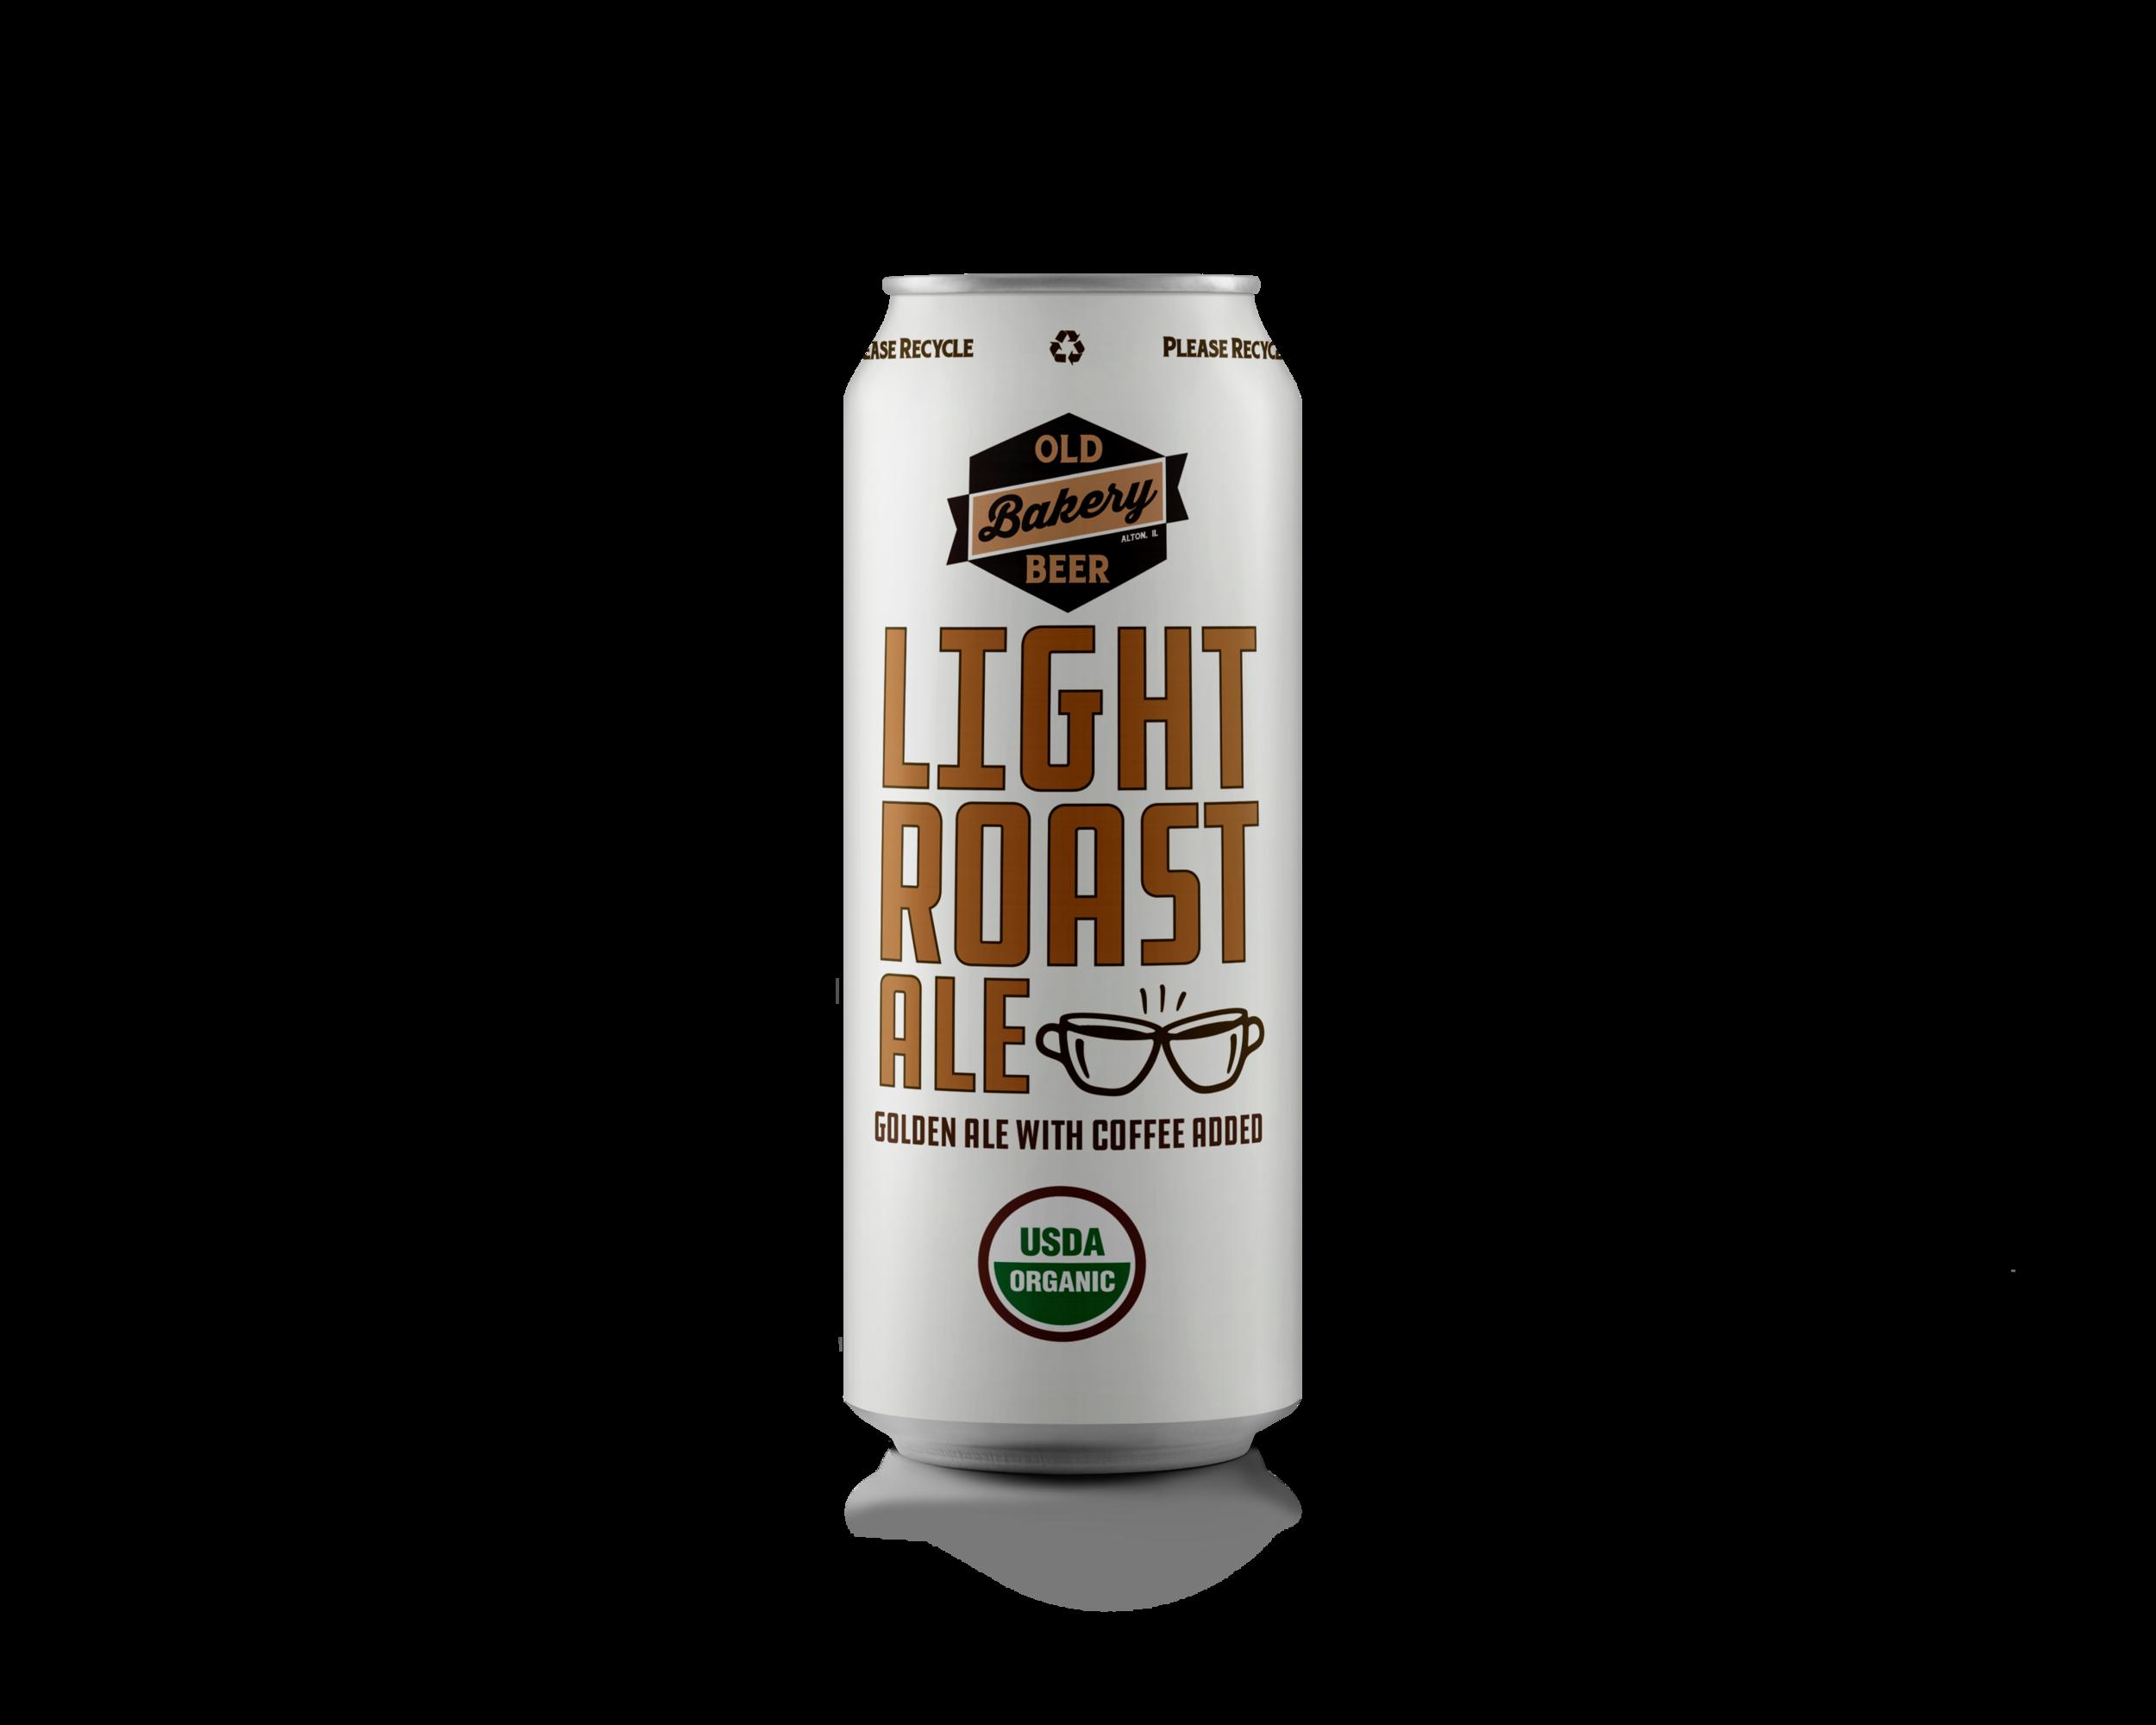 Light Roast Can Mockup nobg.png